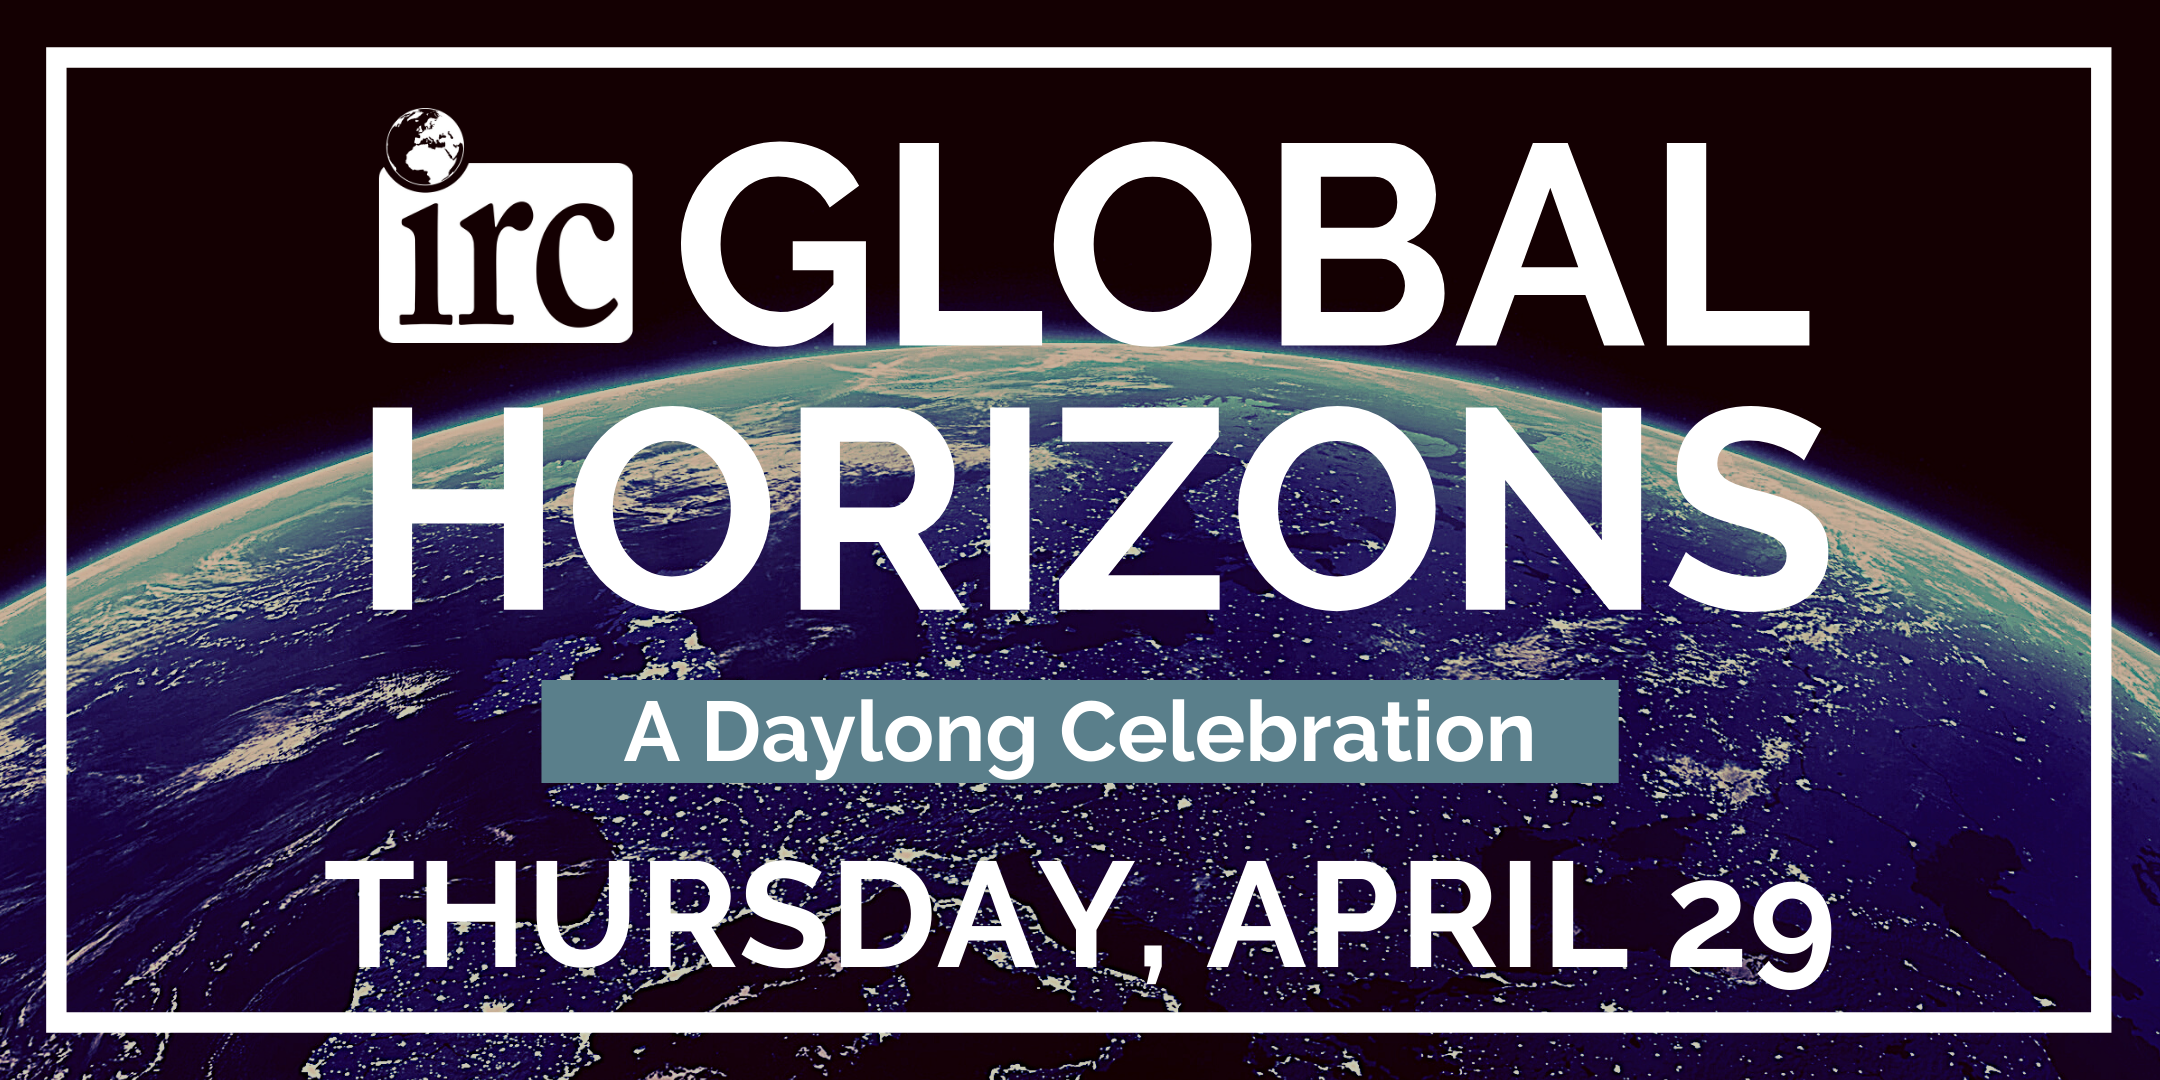 Global Horizons promotional image